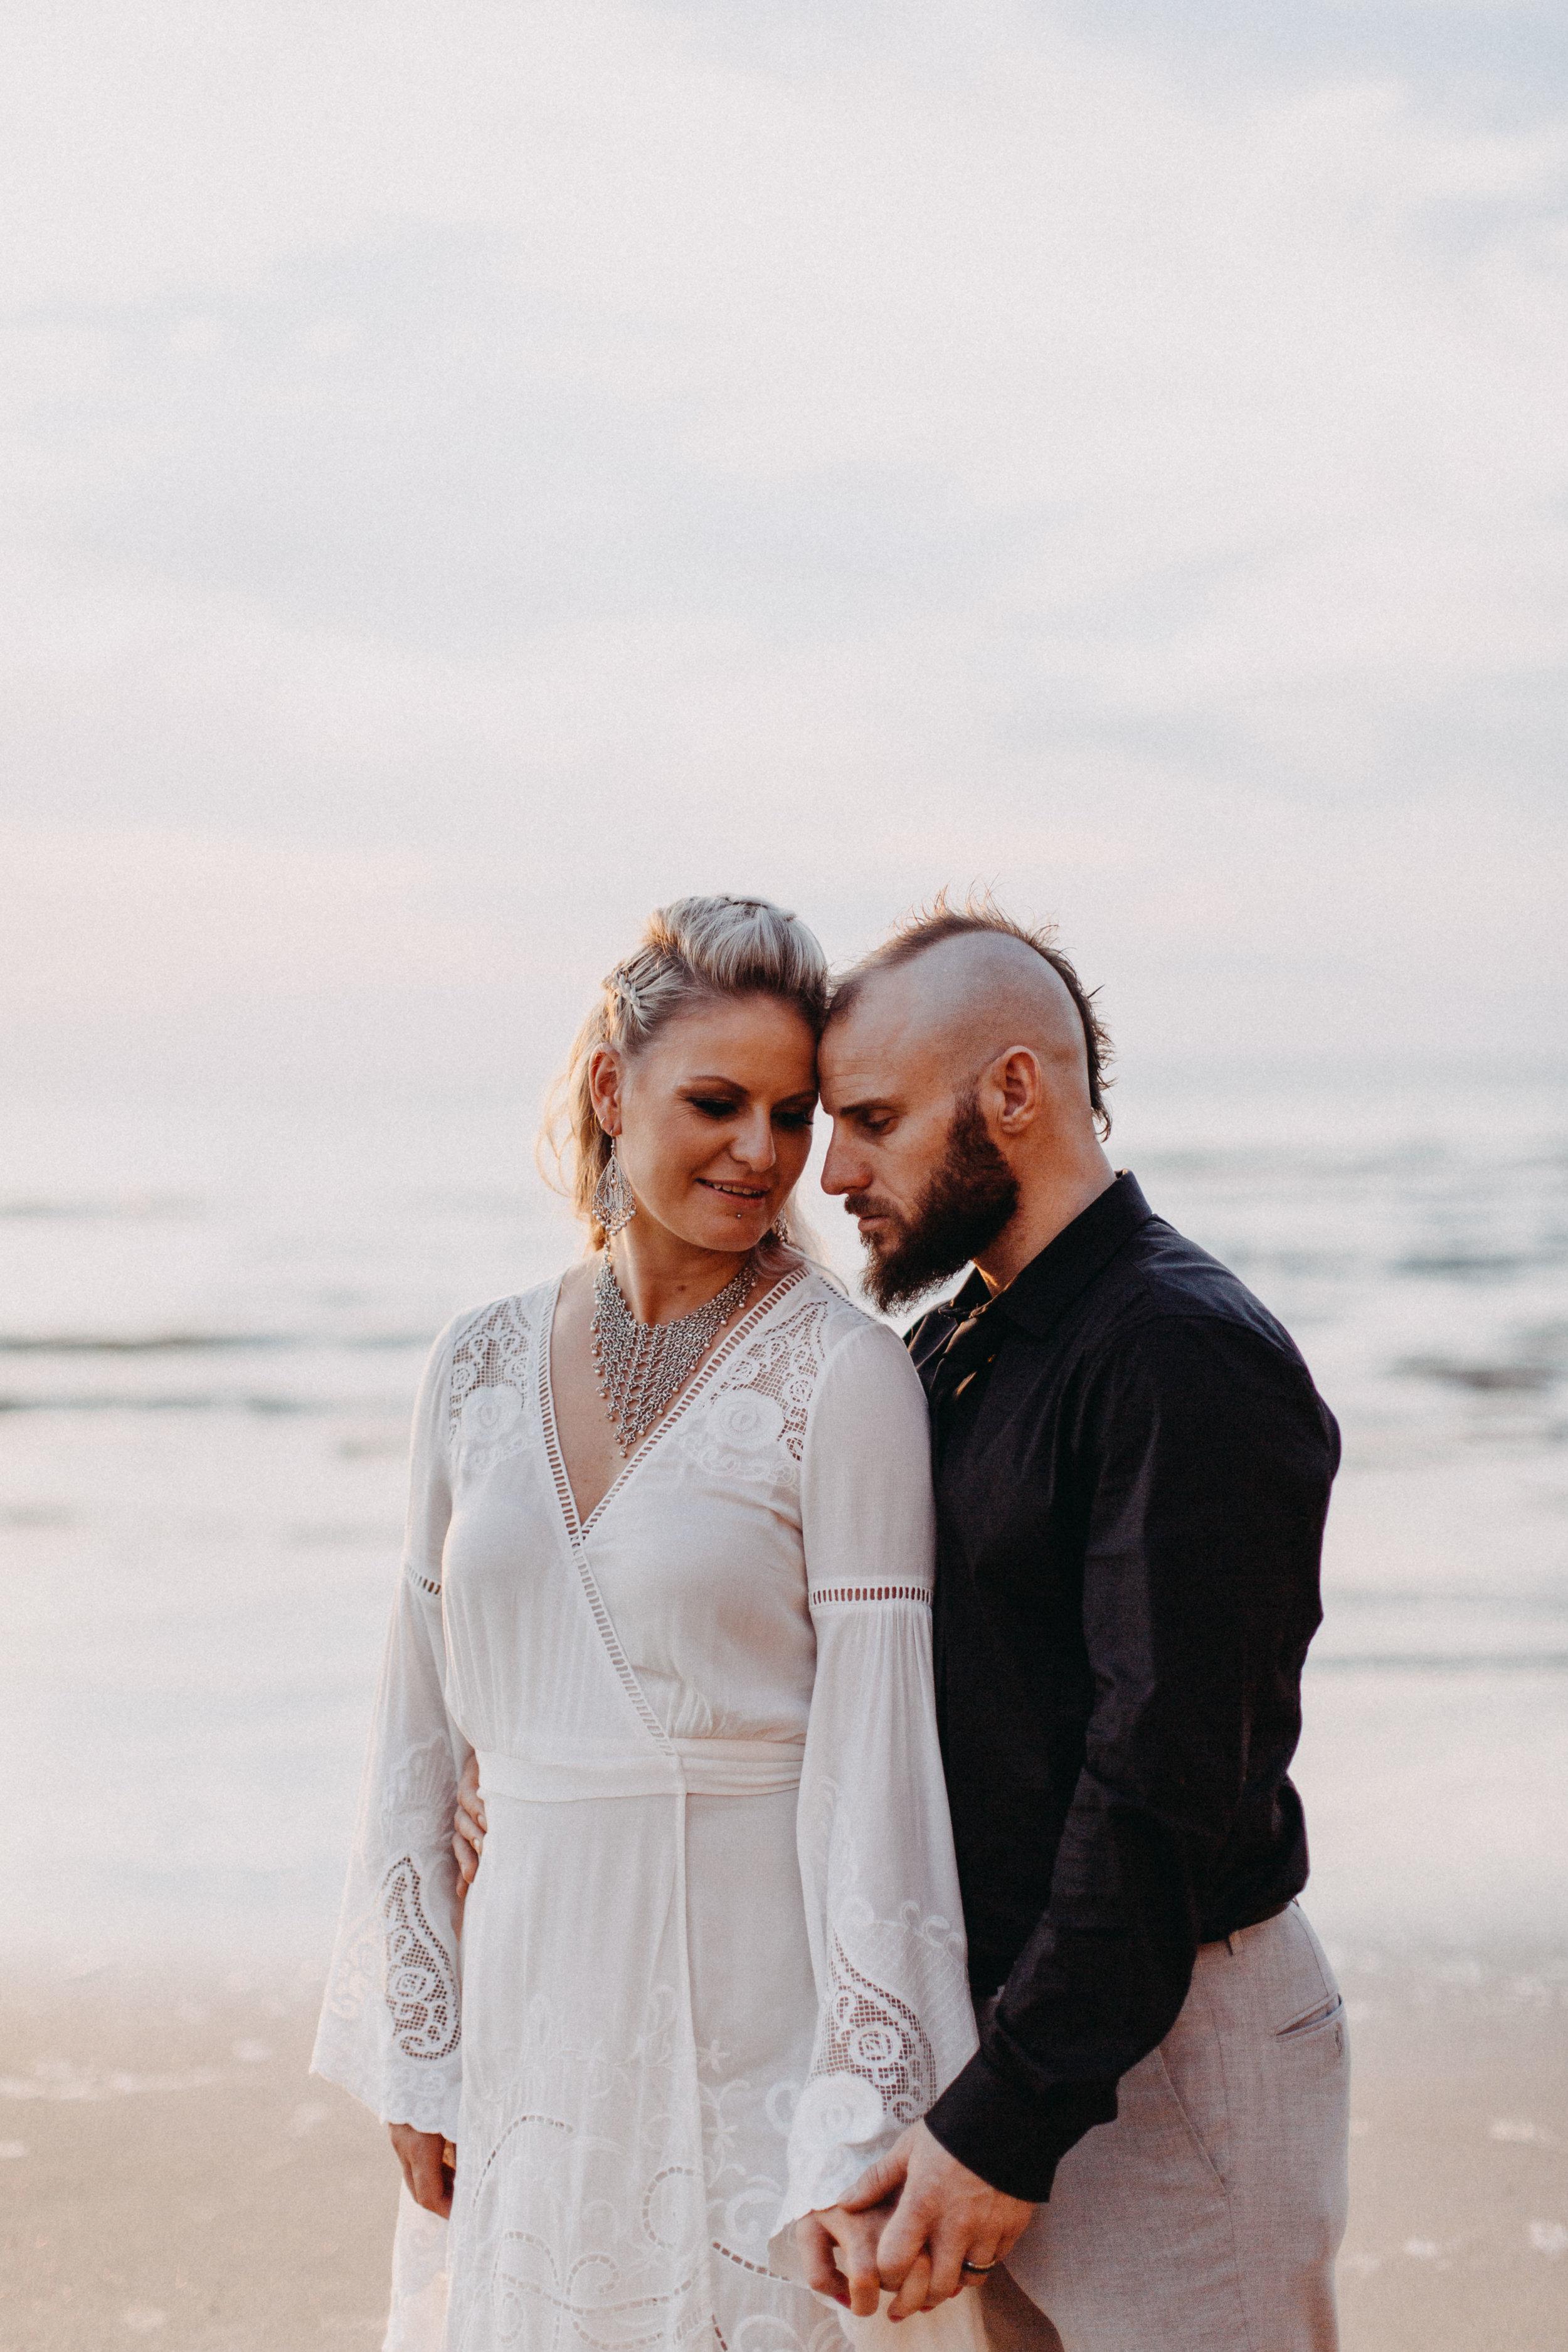 darwin-elopement-wedding-beach-camden-photography-www.emilyobrienphotography.net-84.jpg